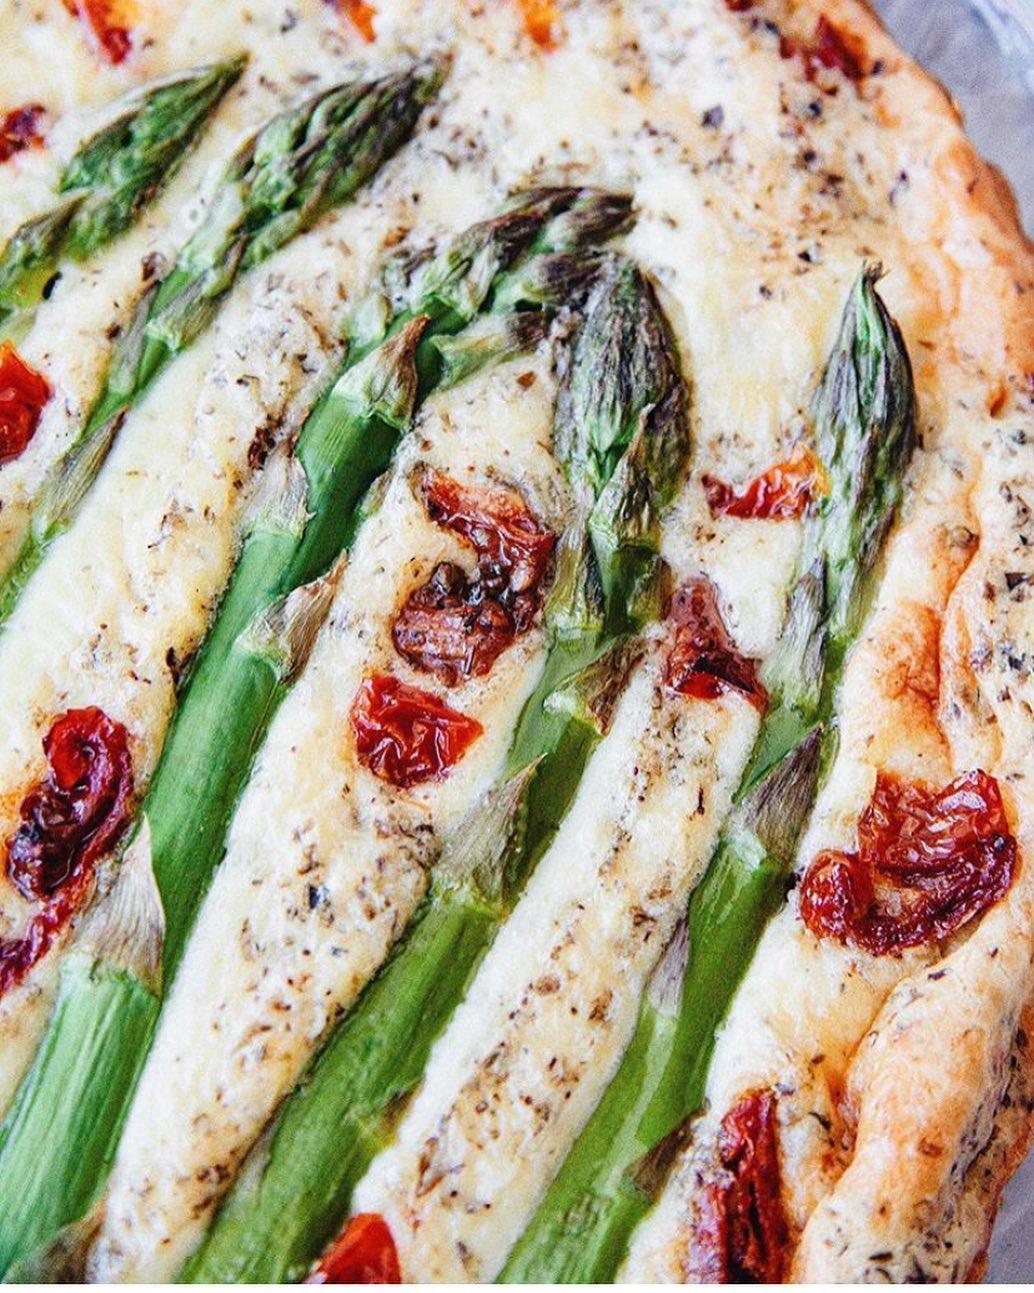 7 Non-Traditional 🦄 Mozzarella Stick Recipes 🍴 to Serve at a Party 🎉 ...